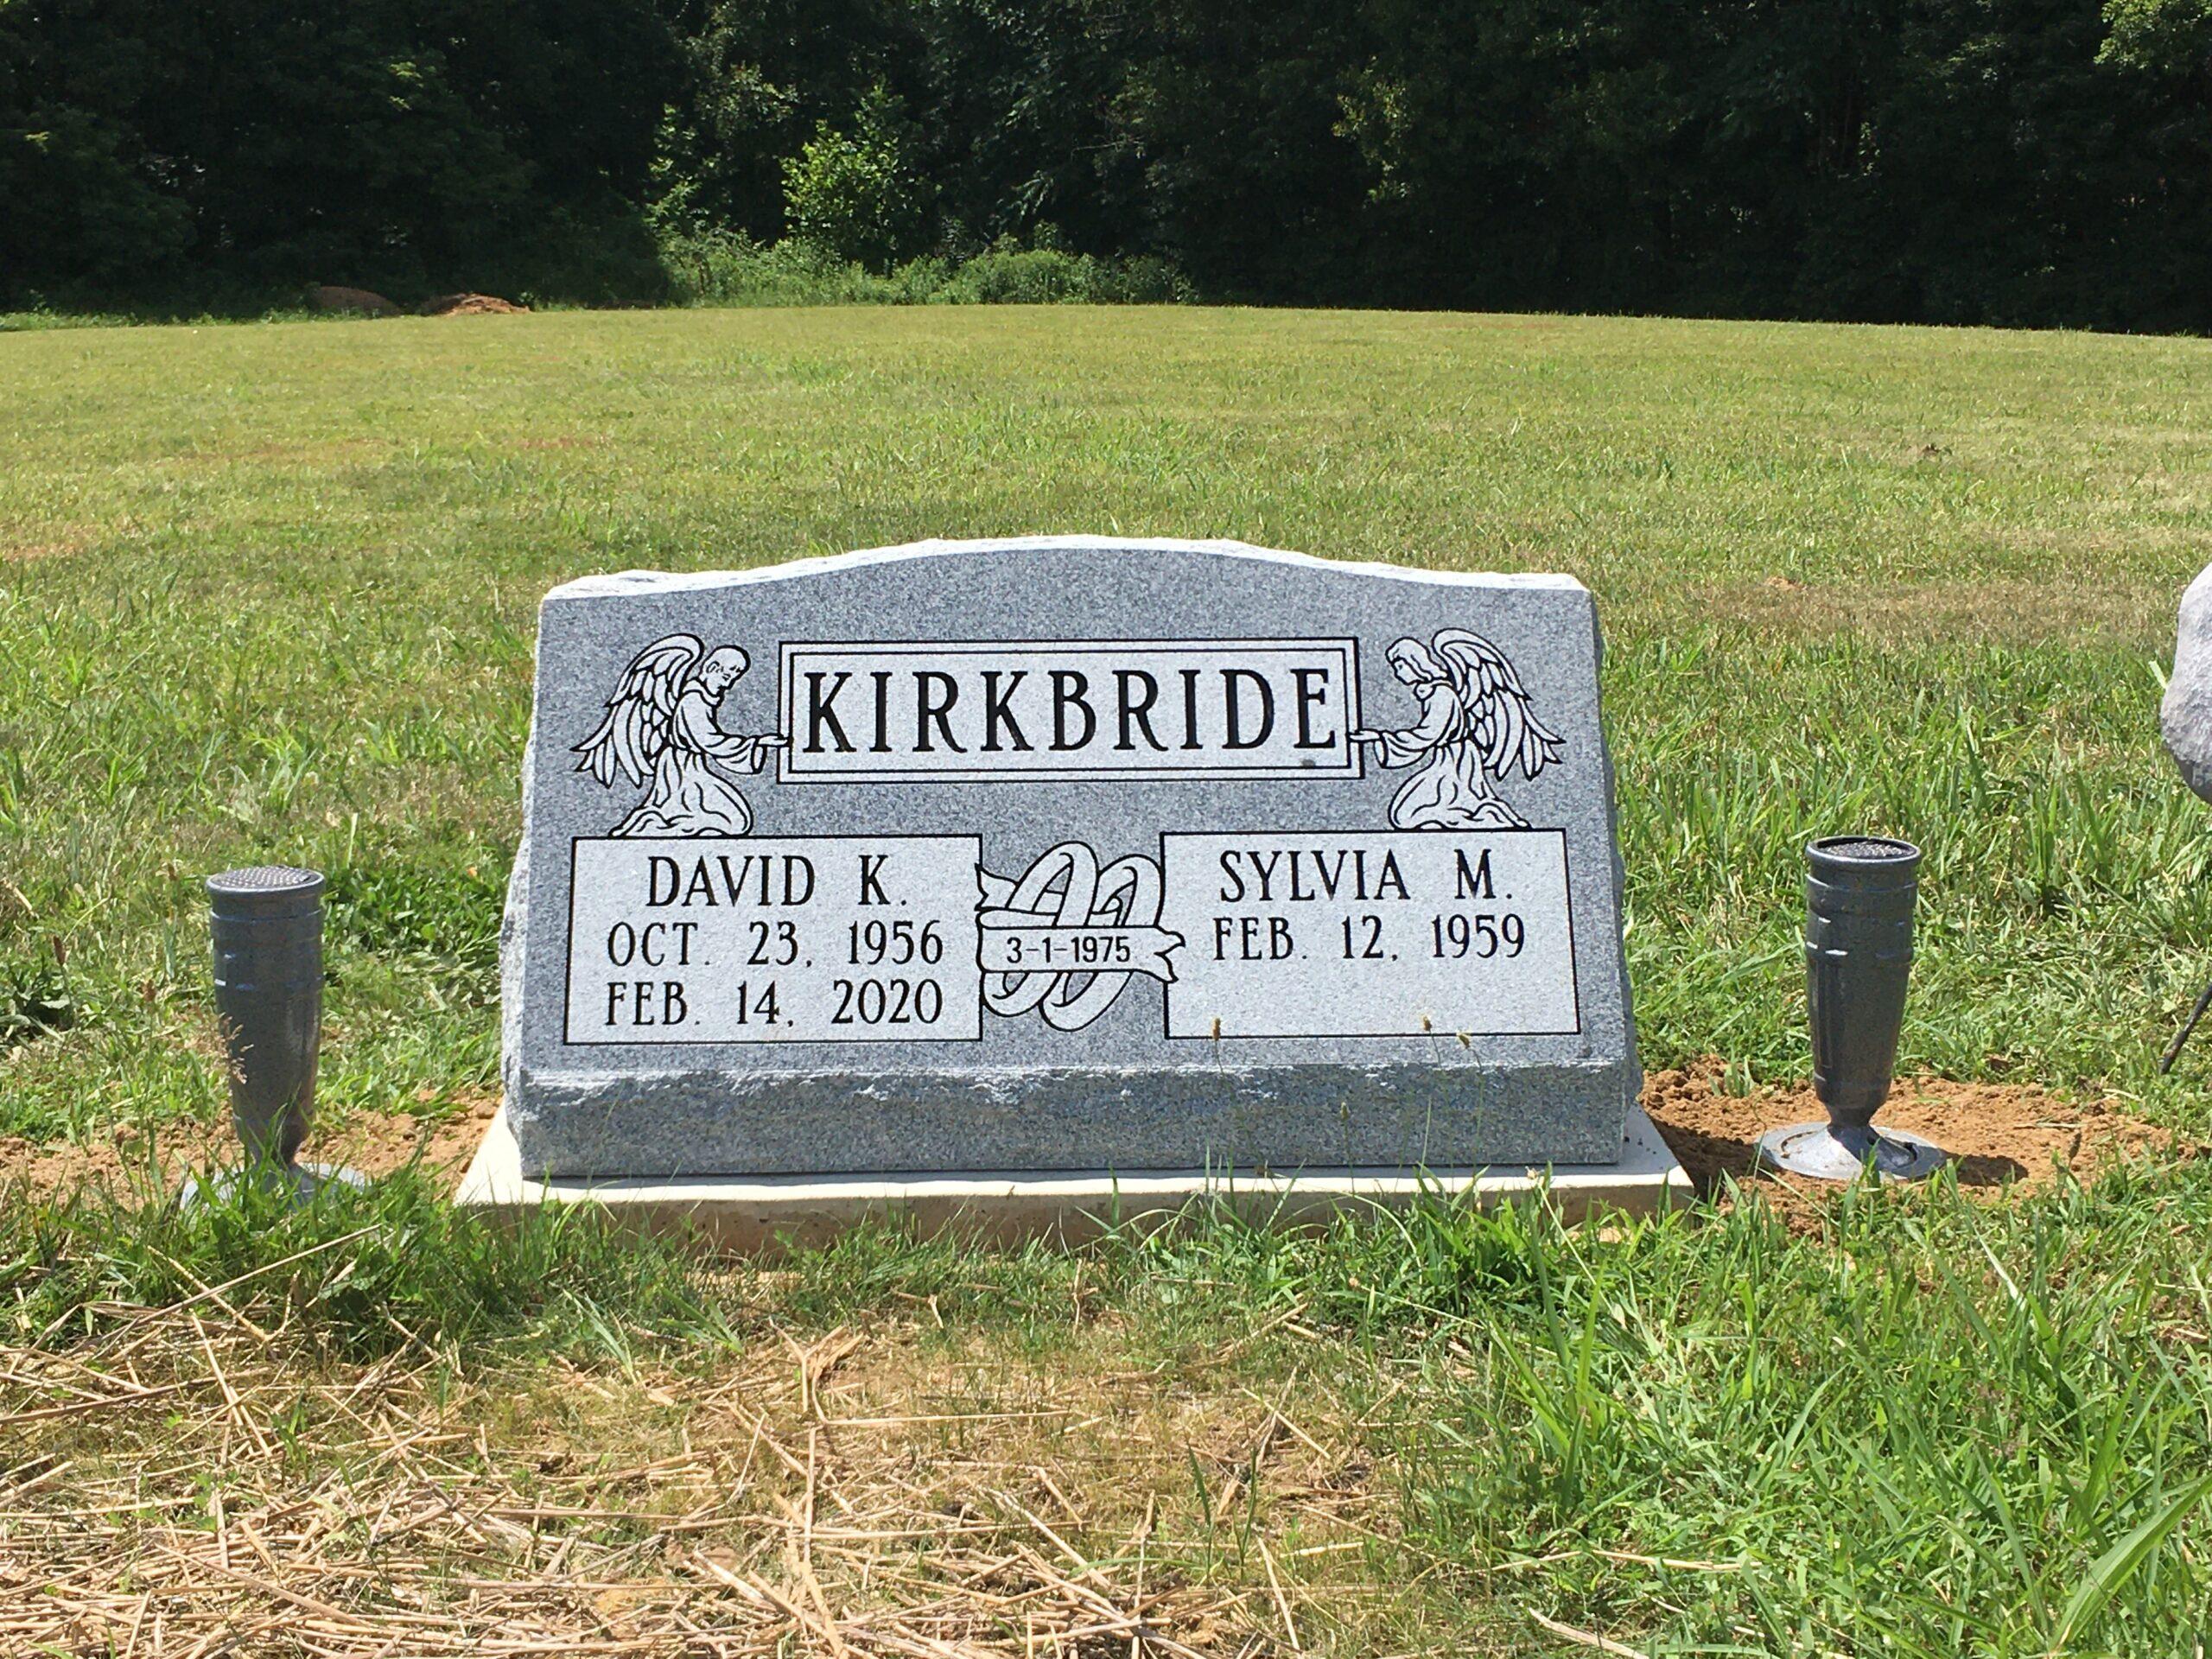 Kirkbride, David